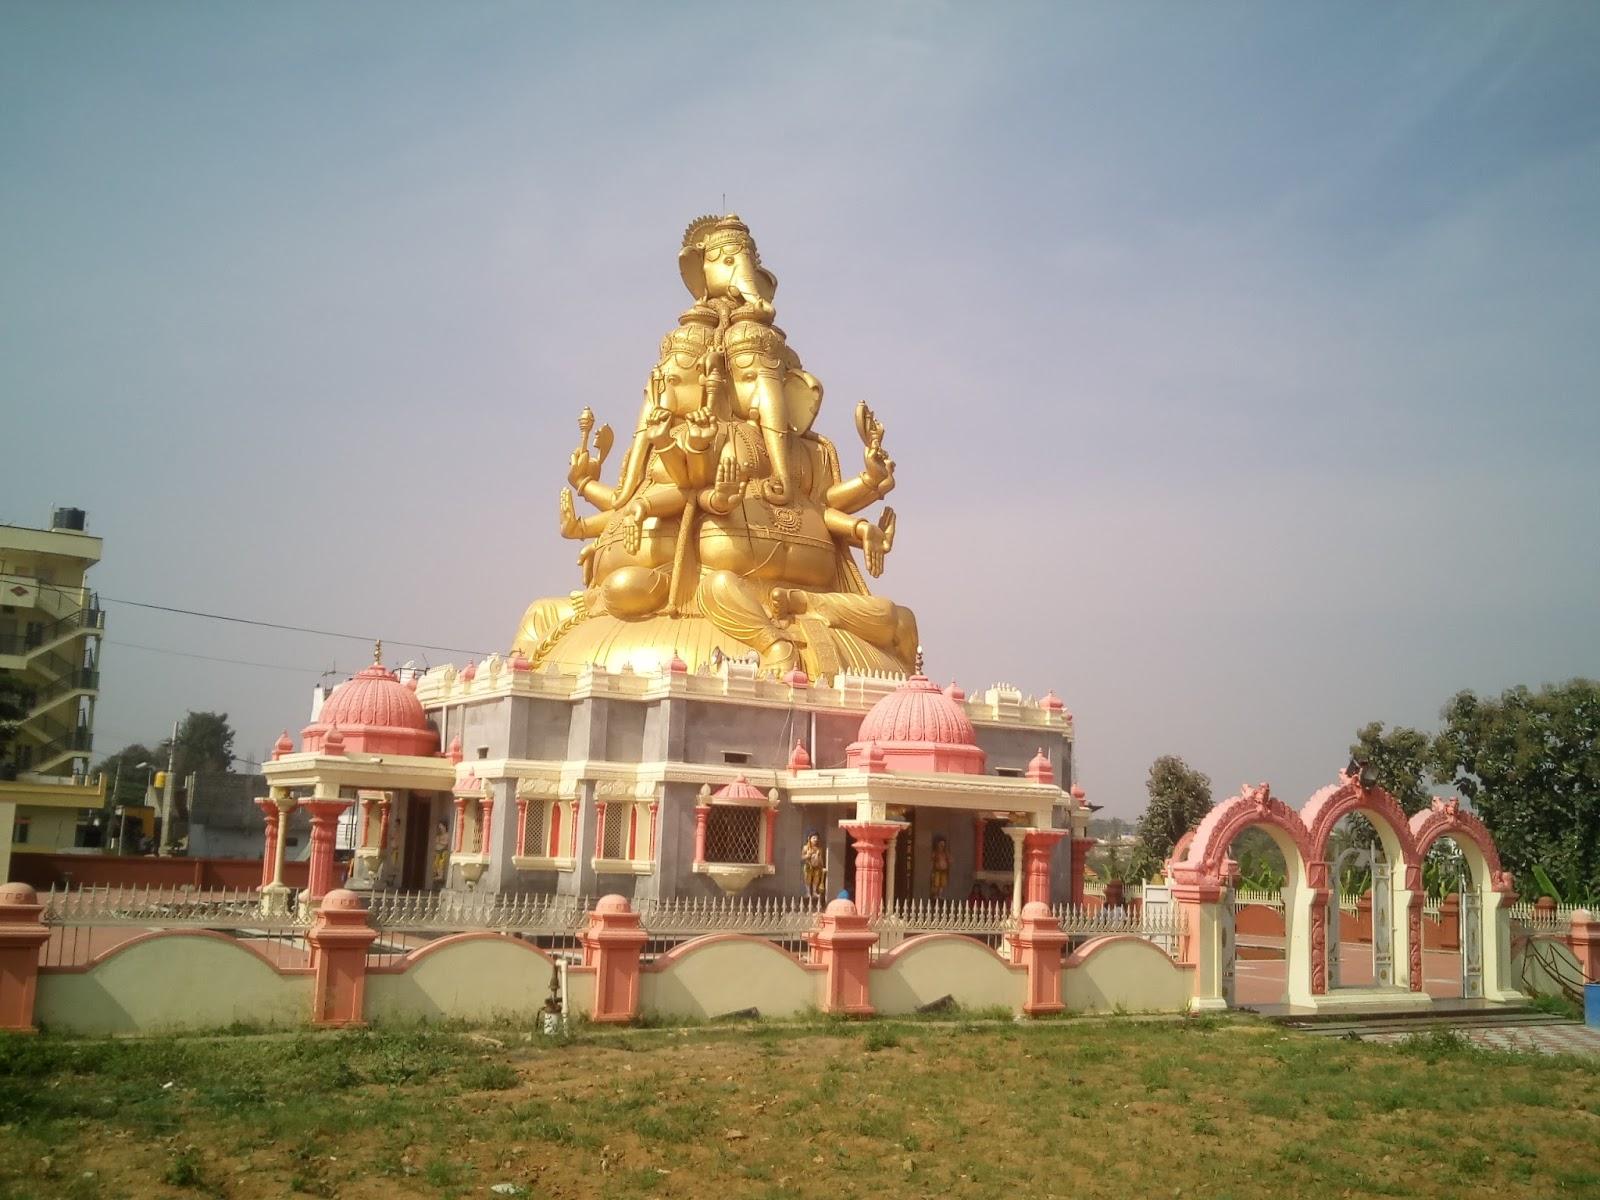 Panchmukhi ganesha temple in bangalore dating 1